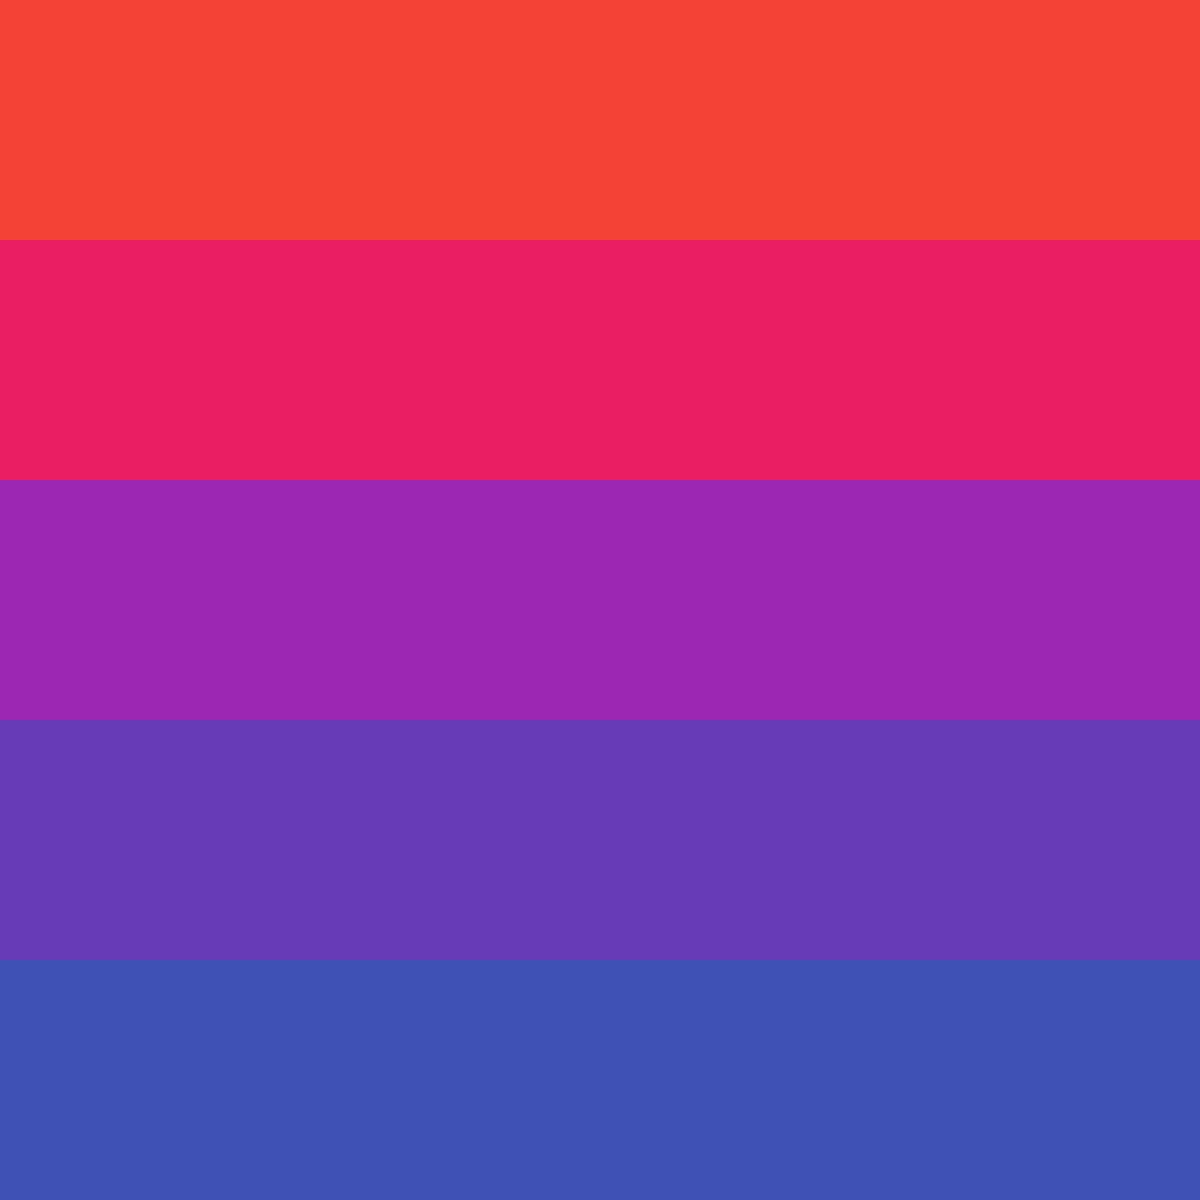 pixilart red purple blue color gradient by lemonpoppy0